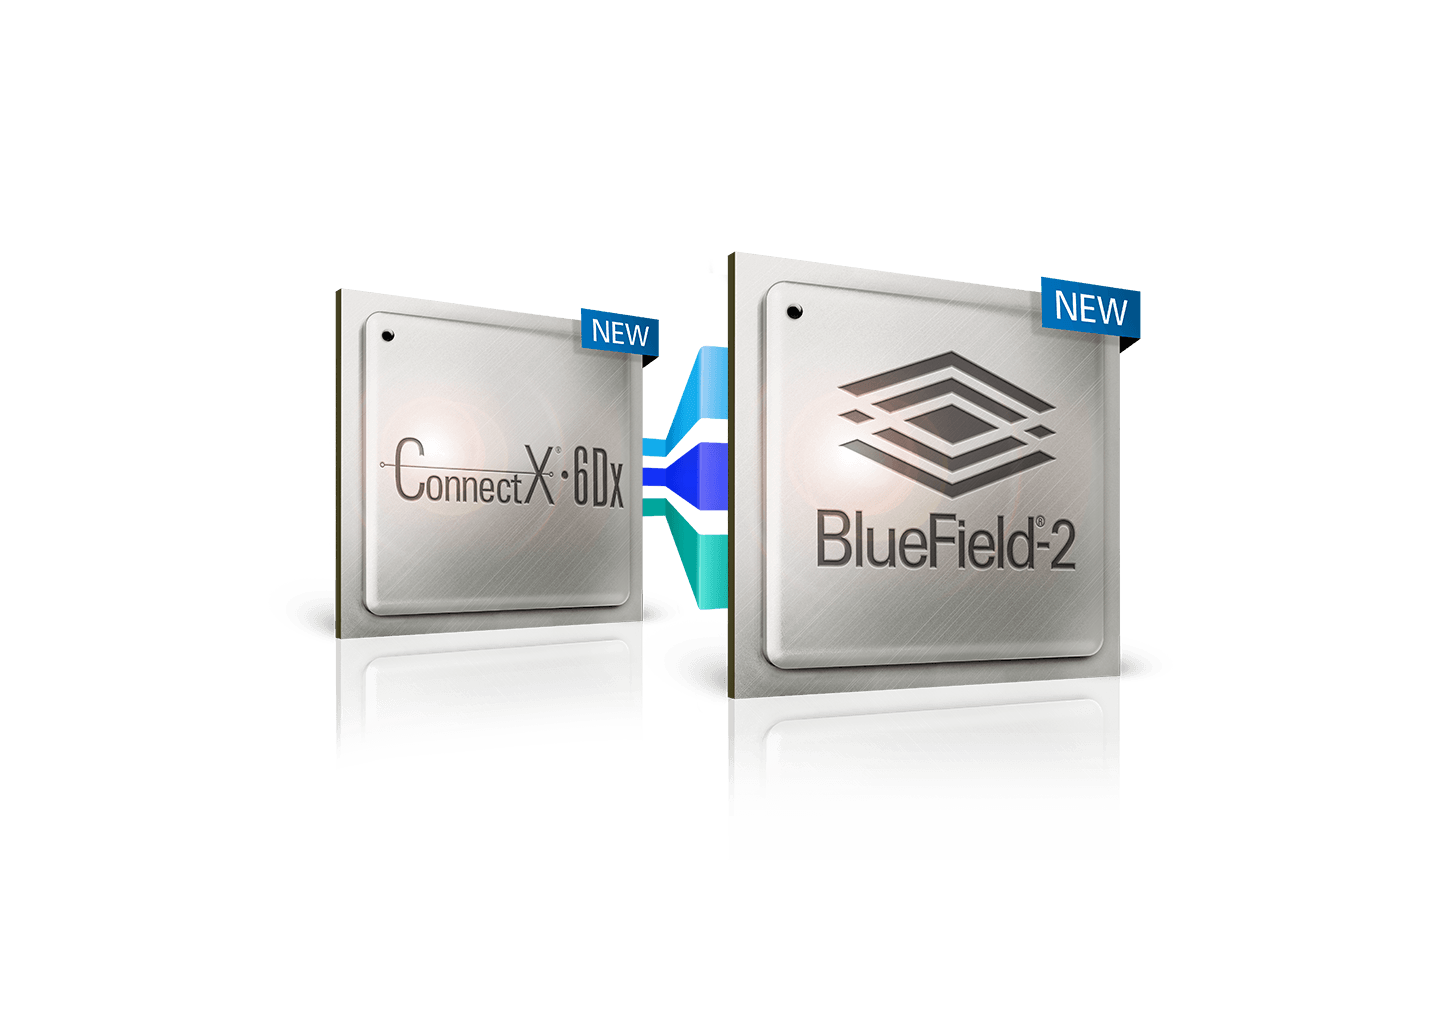 Mellanox_ConnectX6Dx_BlueField2